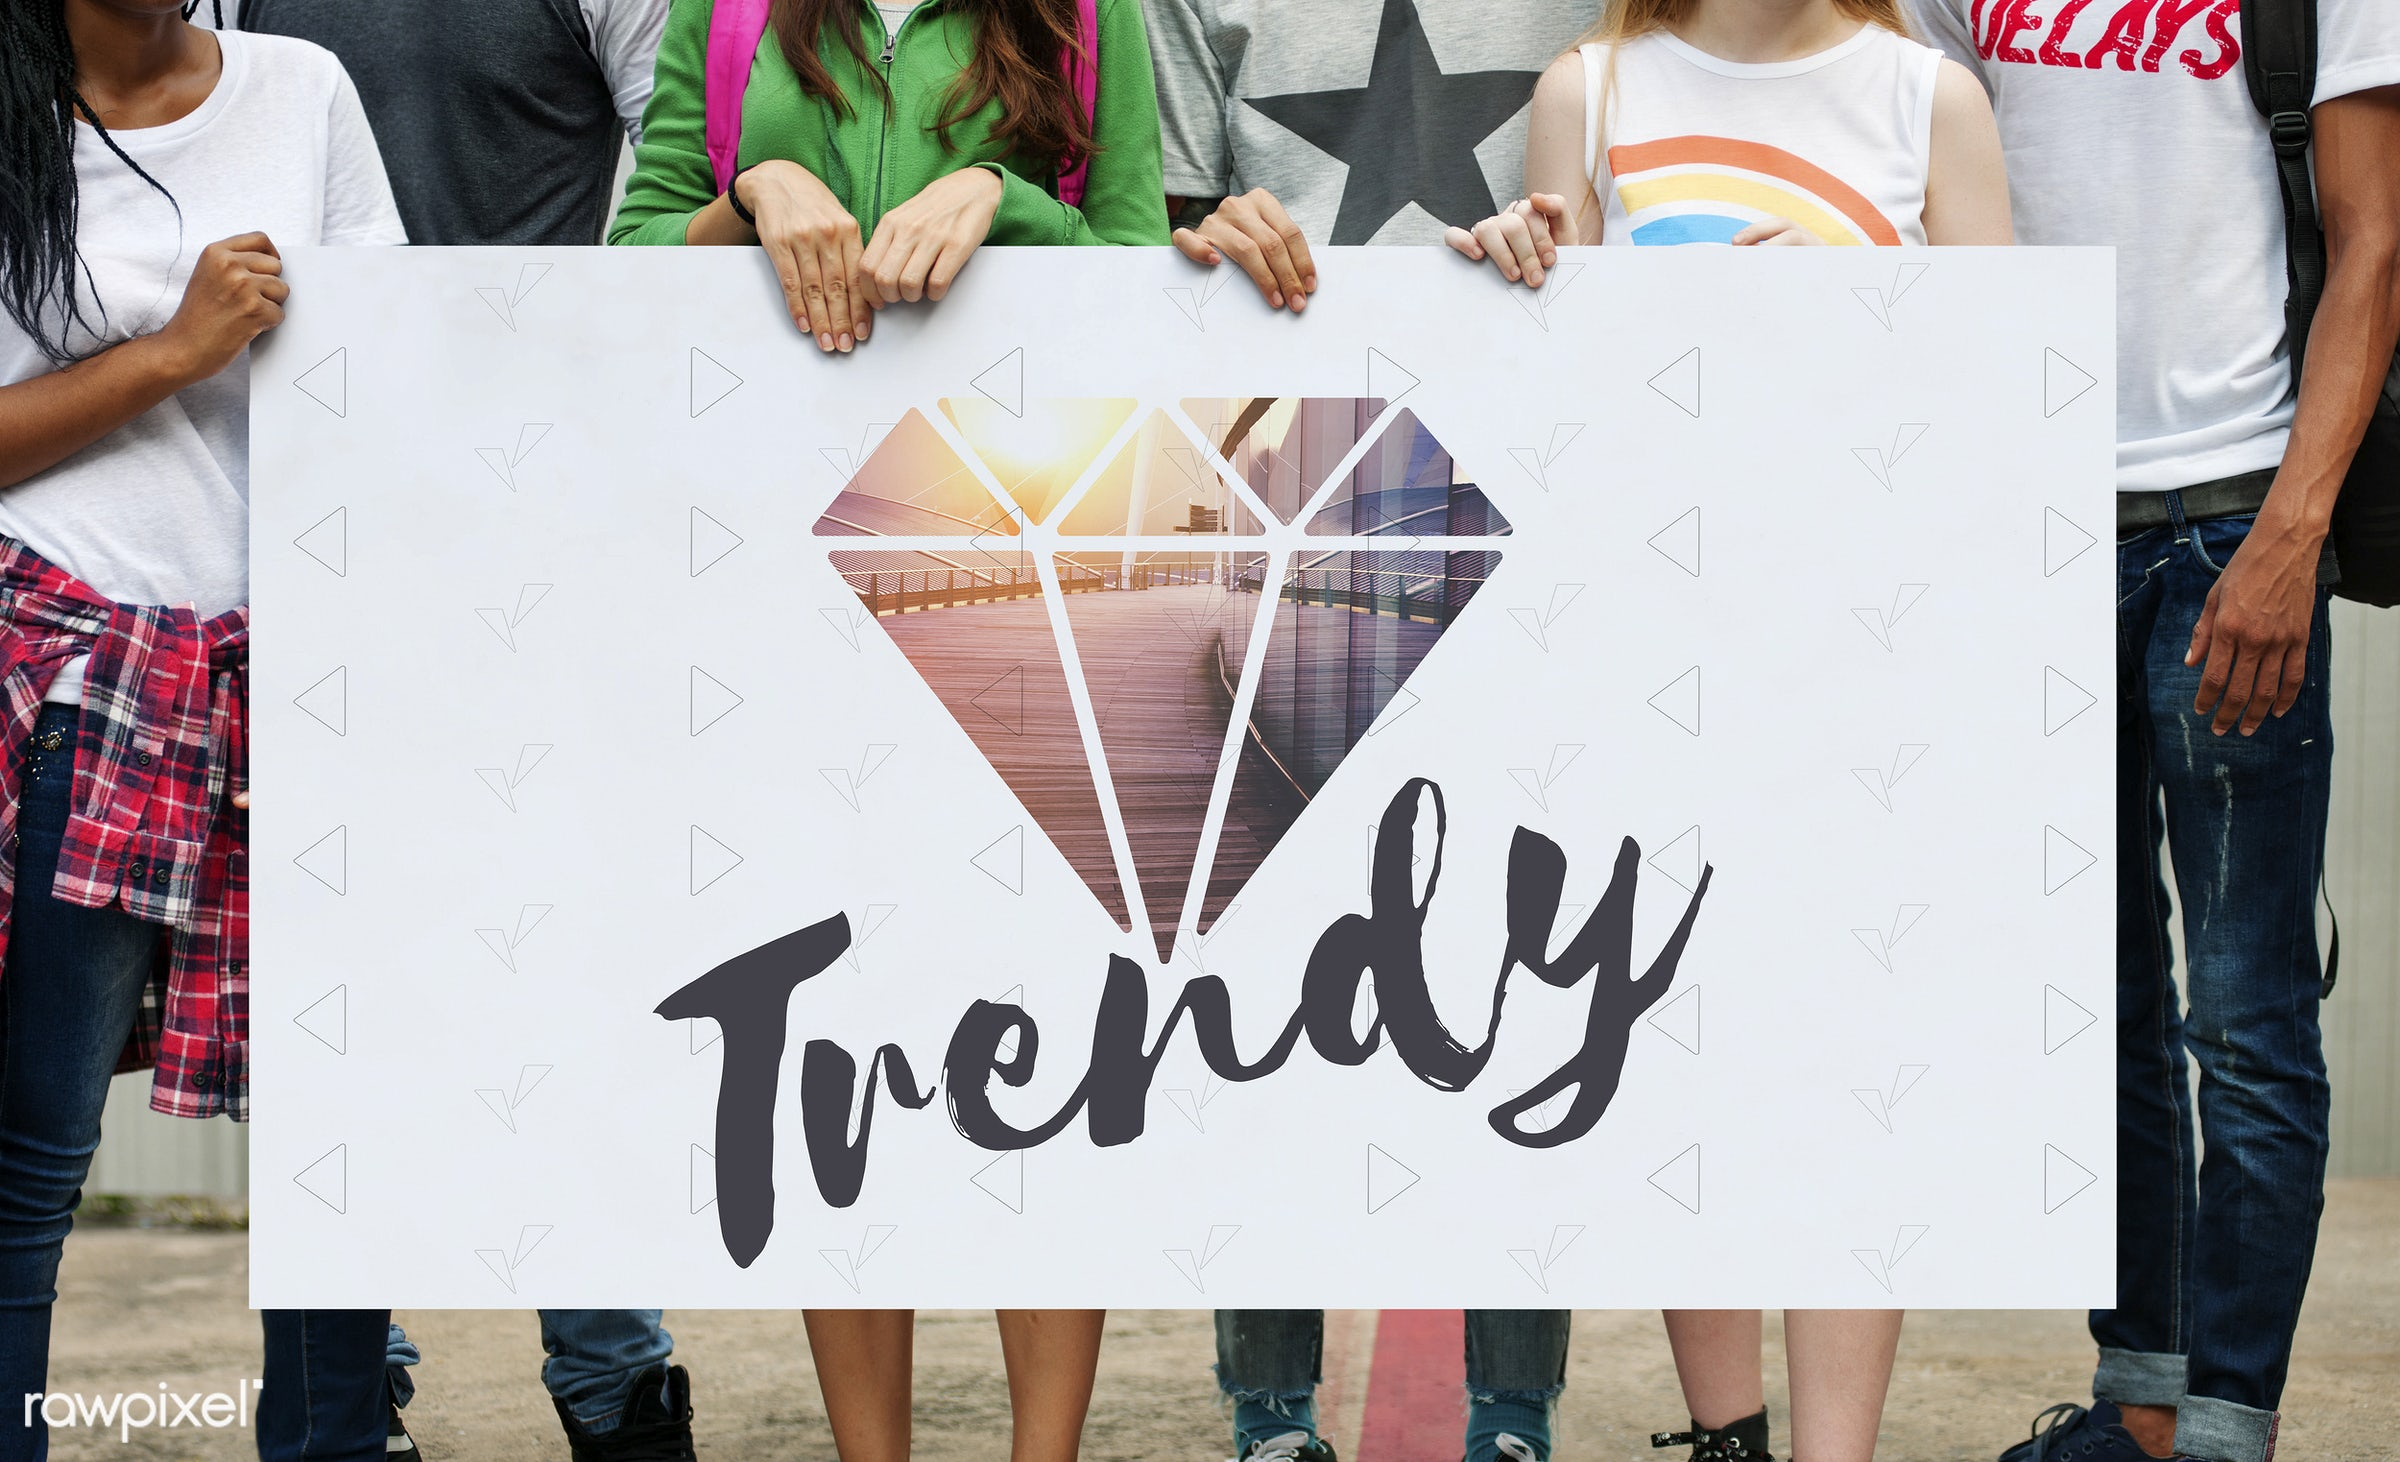 african descent, art, asian, business, caucasian, creative, design, diamond, diversity, edit, enjoyment, fashion, forecast,...